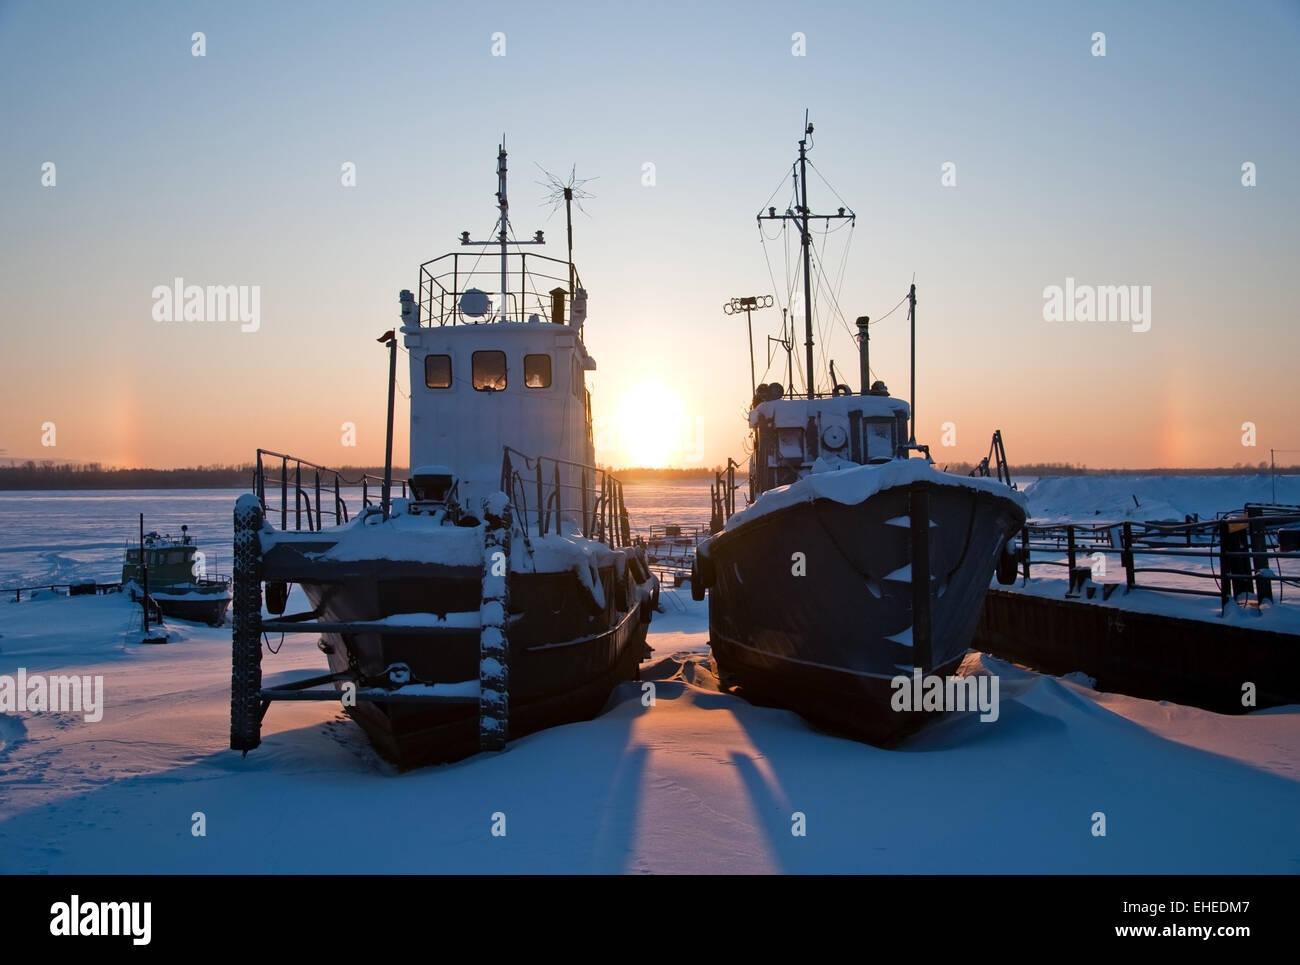 await  season of navigation. - Stock Image